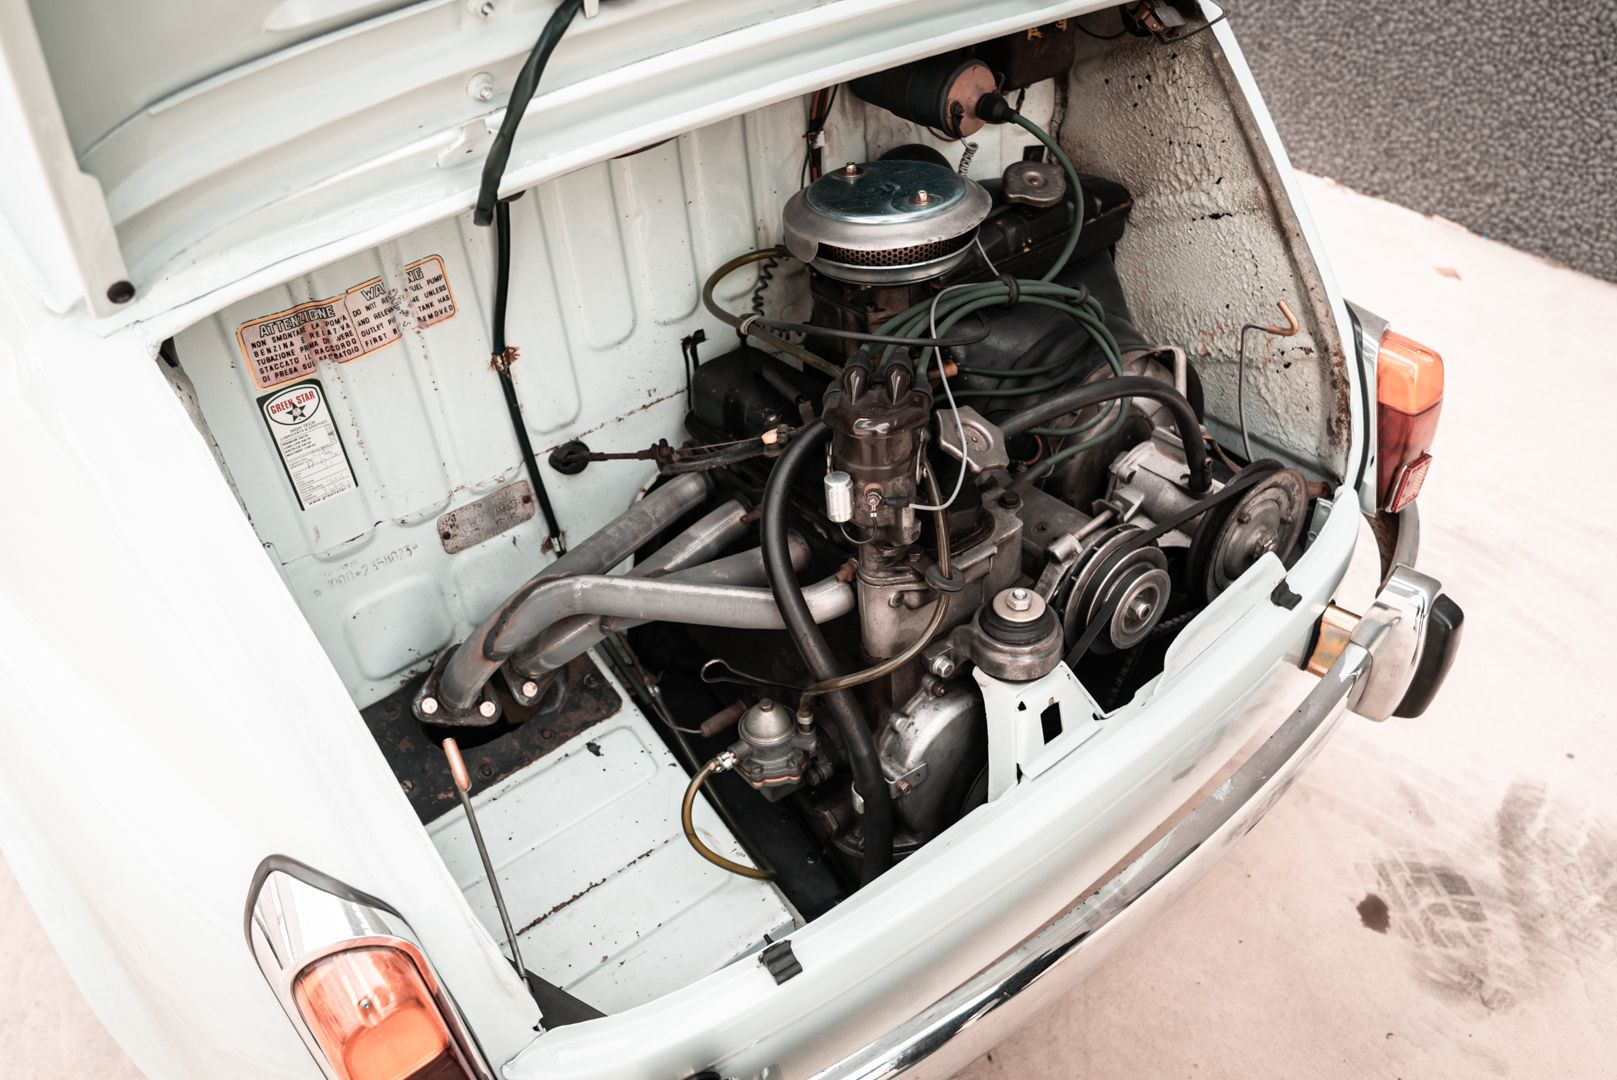 1968 Fiat Giannini 750 TV Turismo Veloce 77119